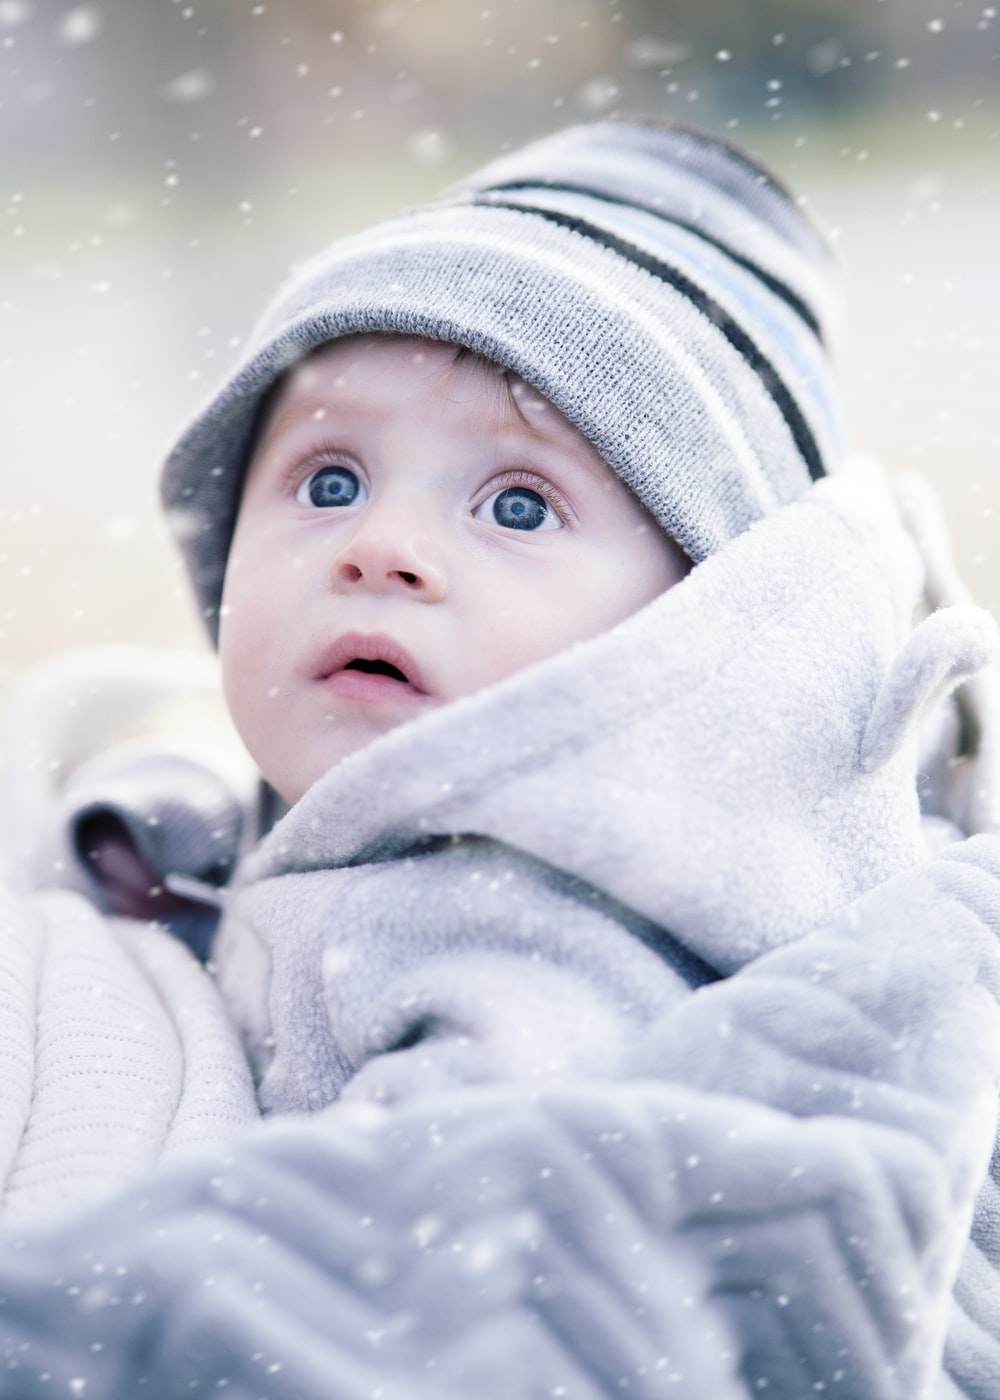 baby's knit cap